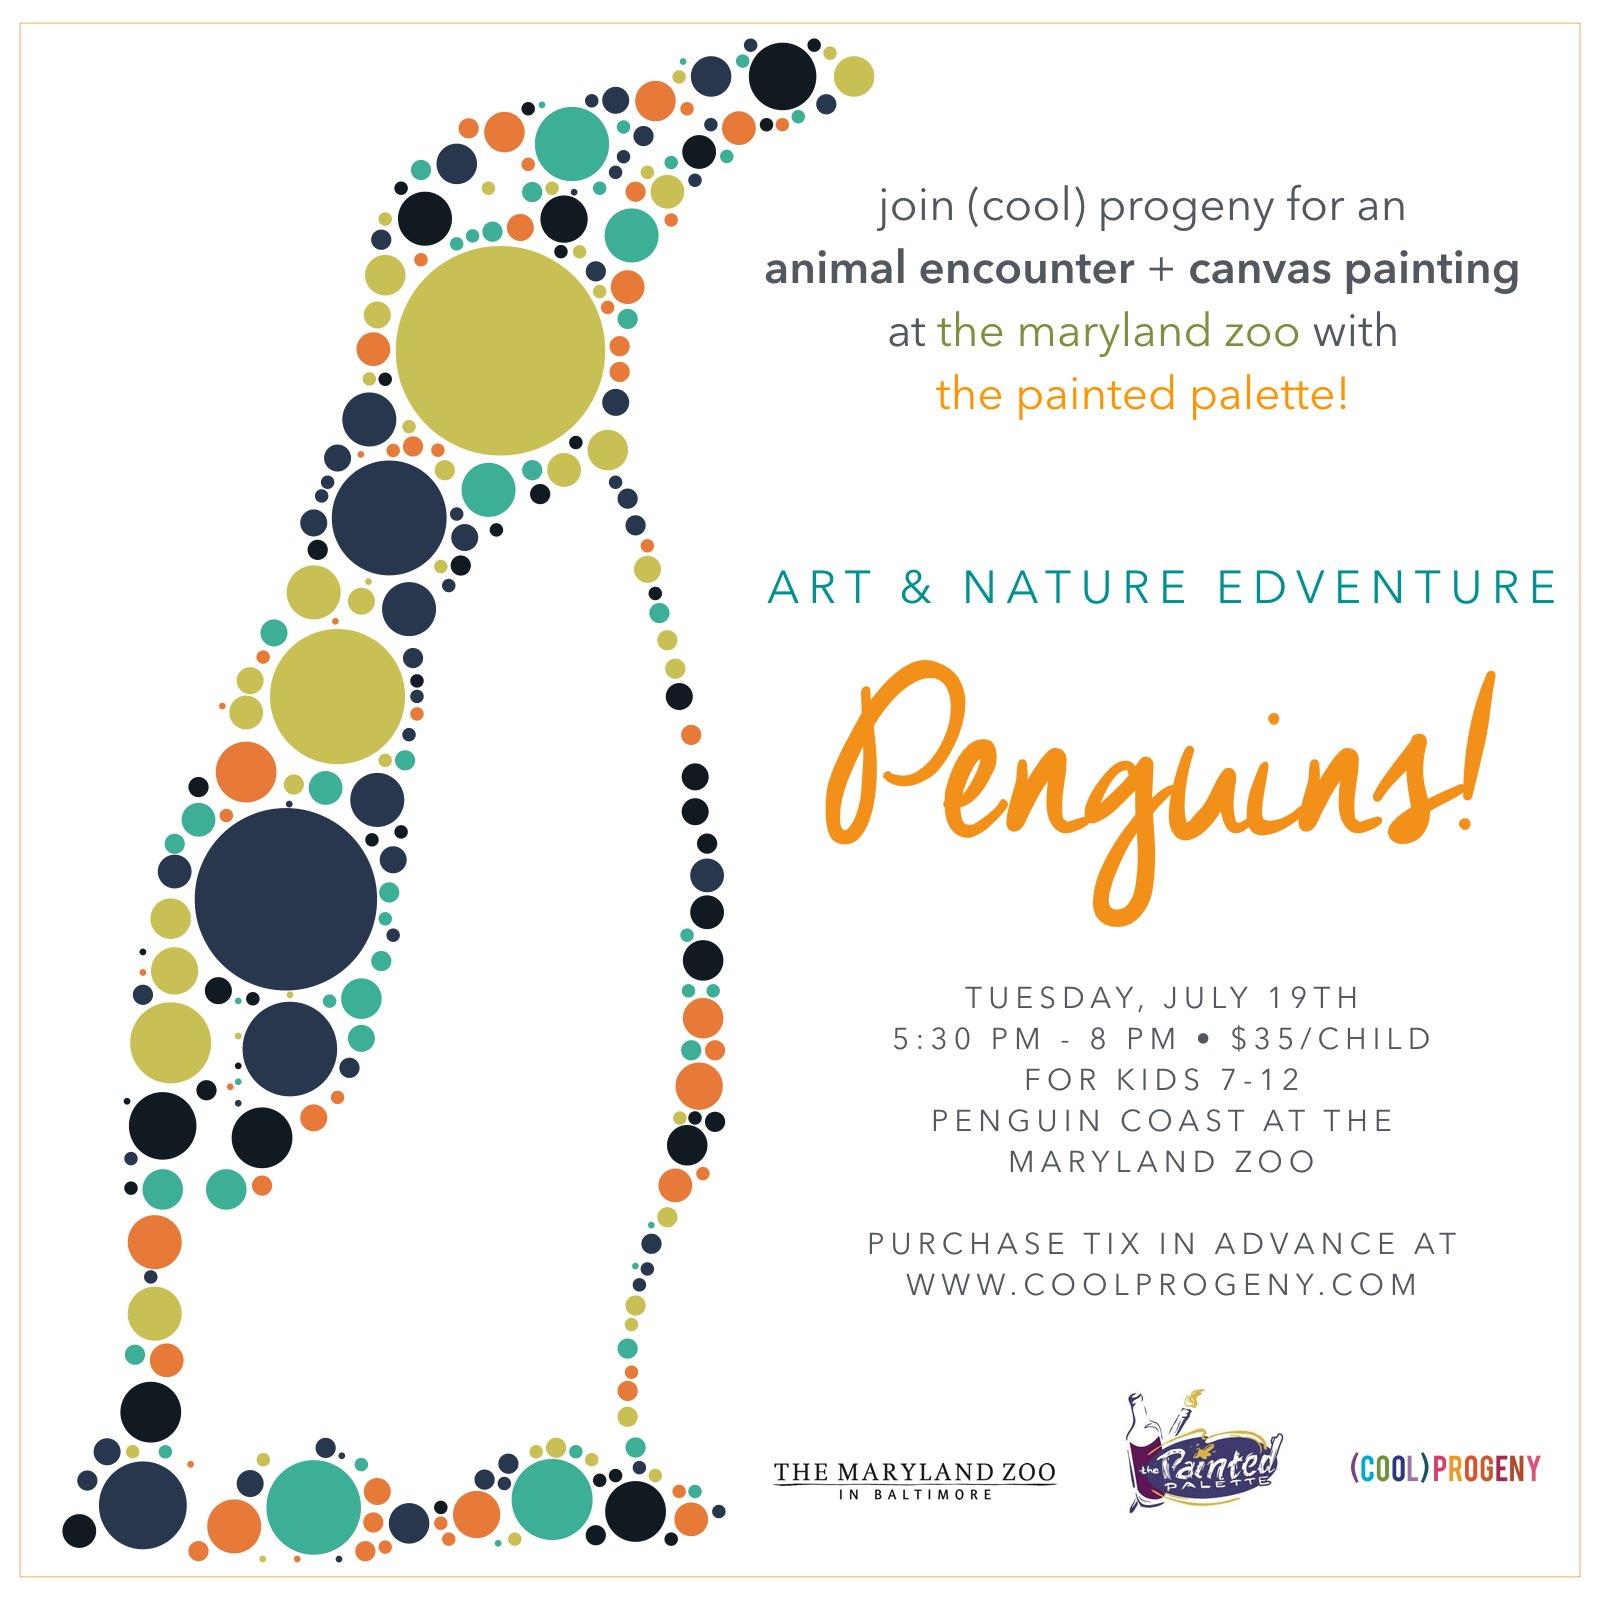 art + nature edventure: penguins! - (cool) progeny